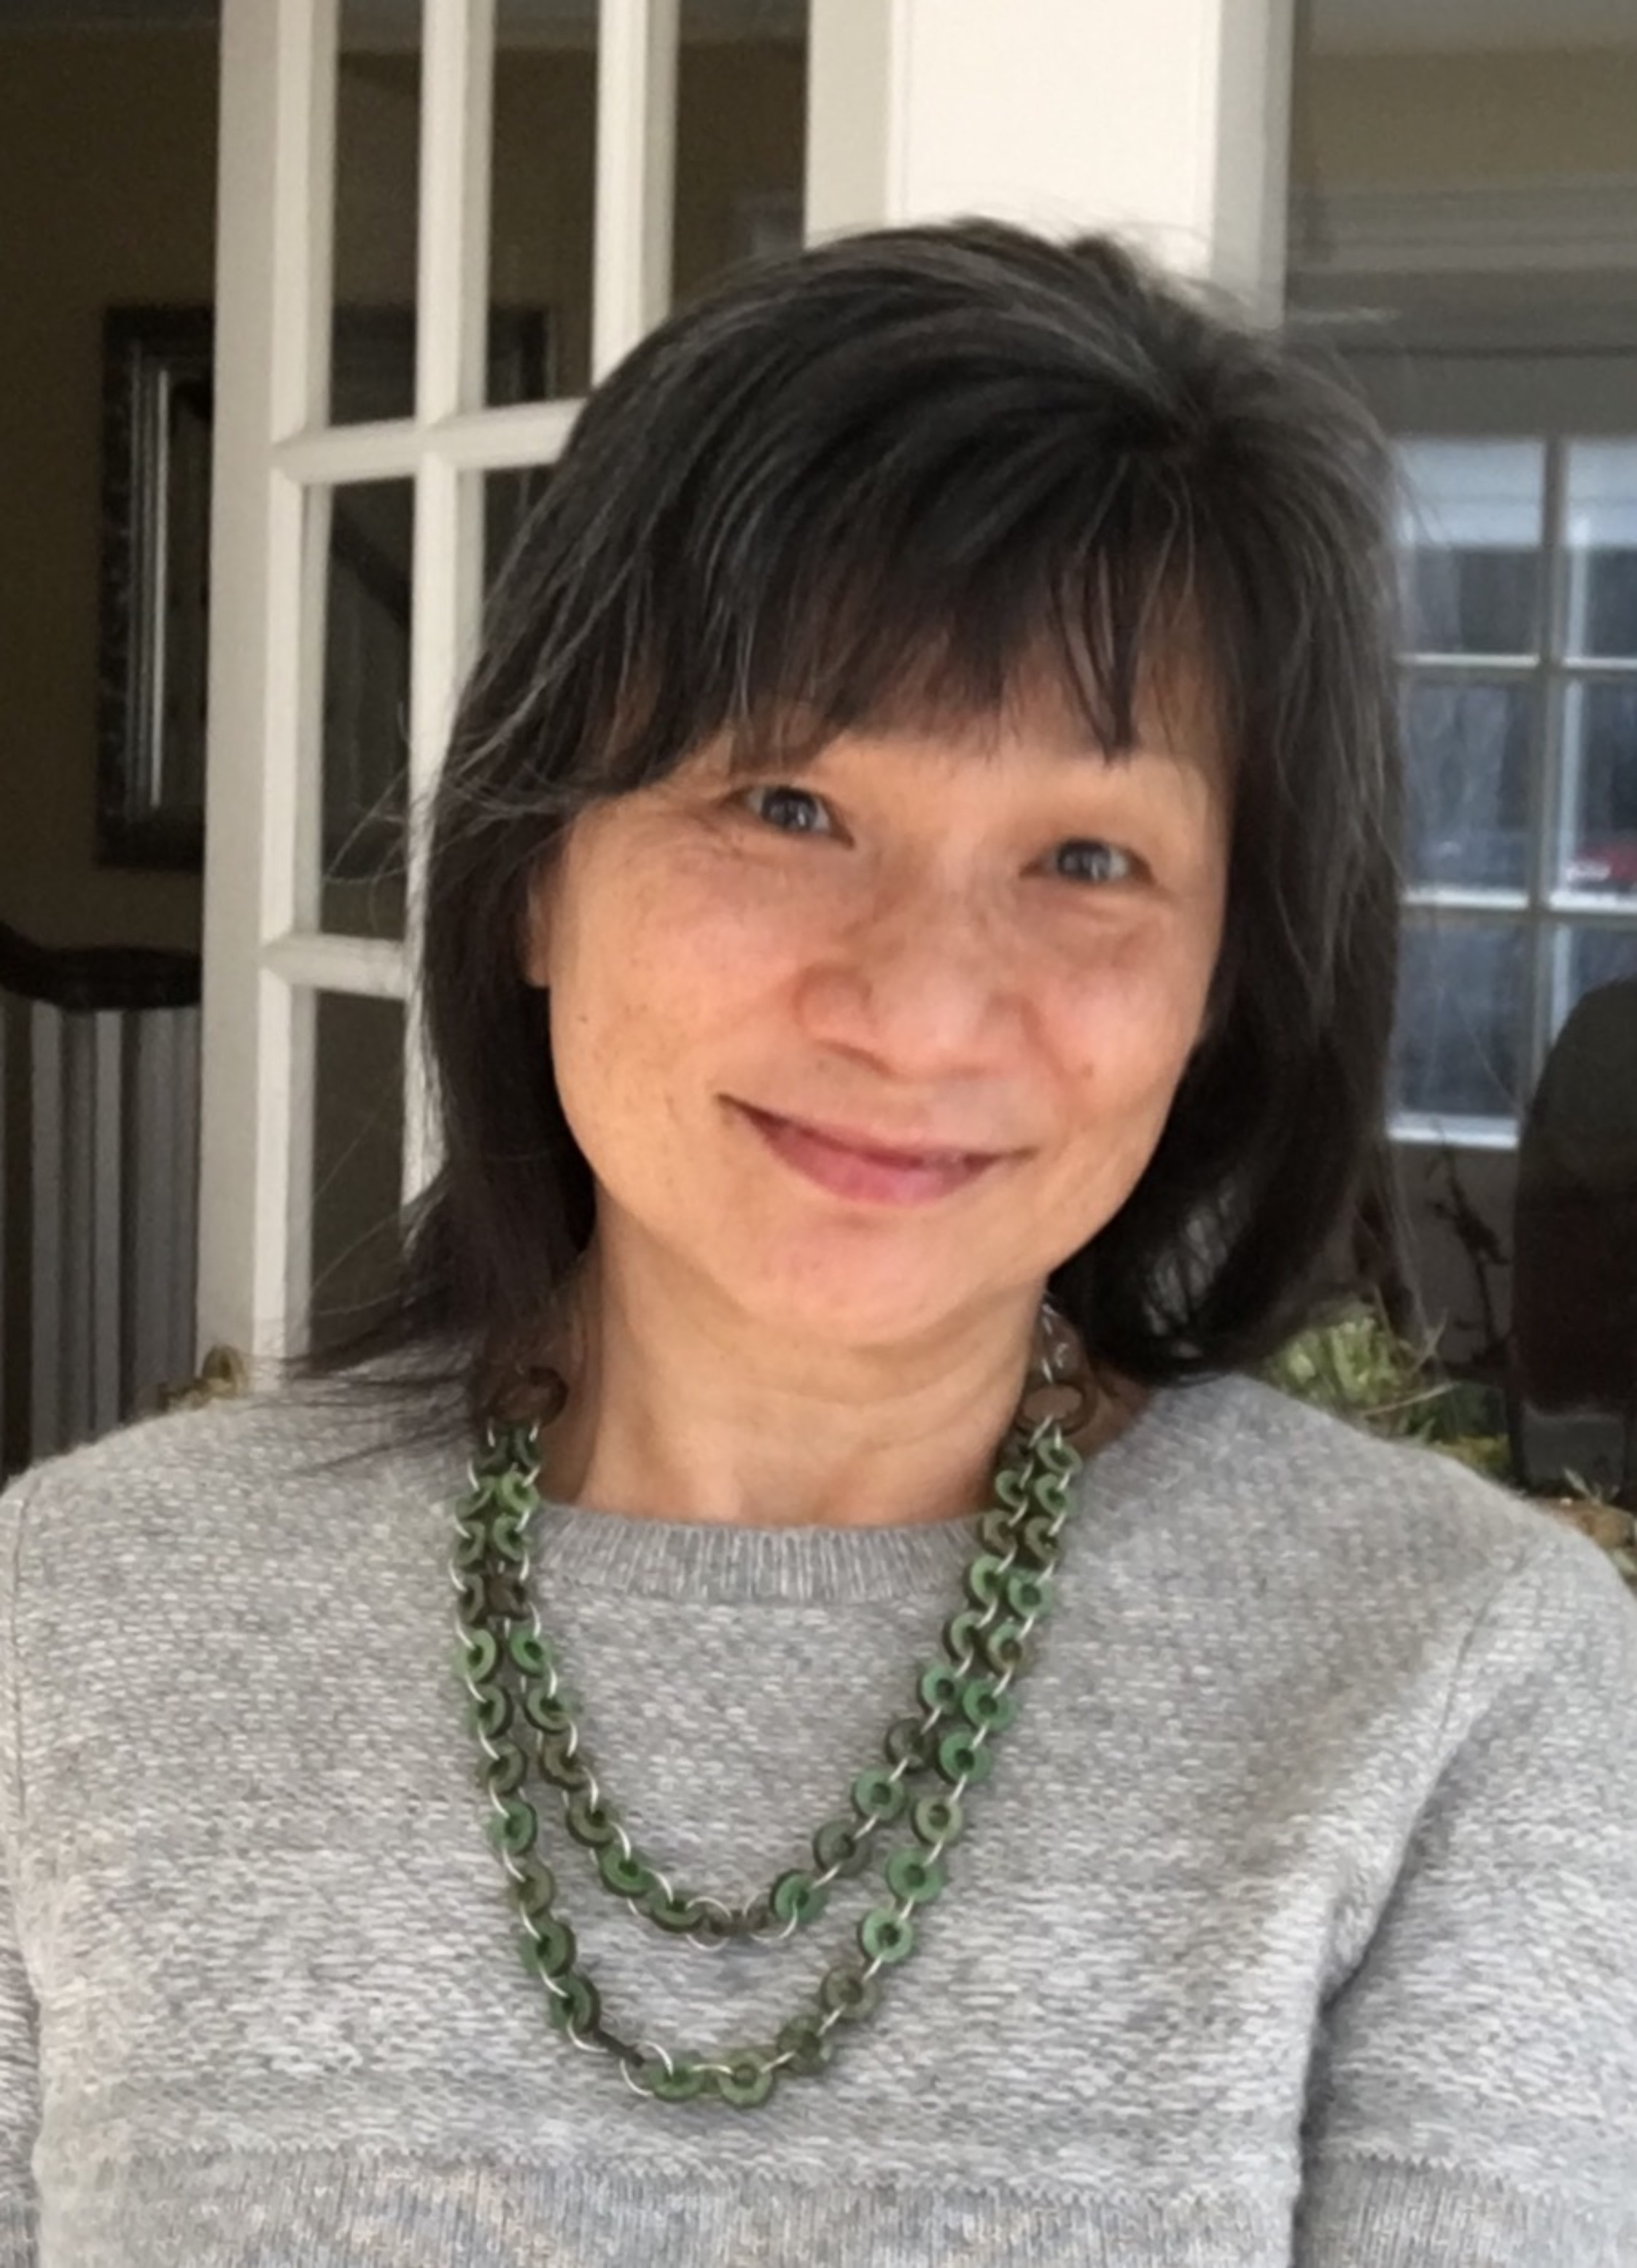 Barbara undefined Han